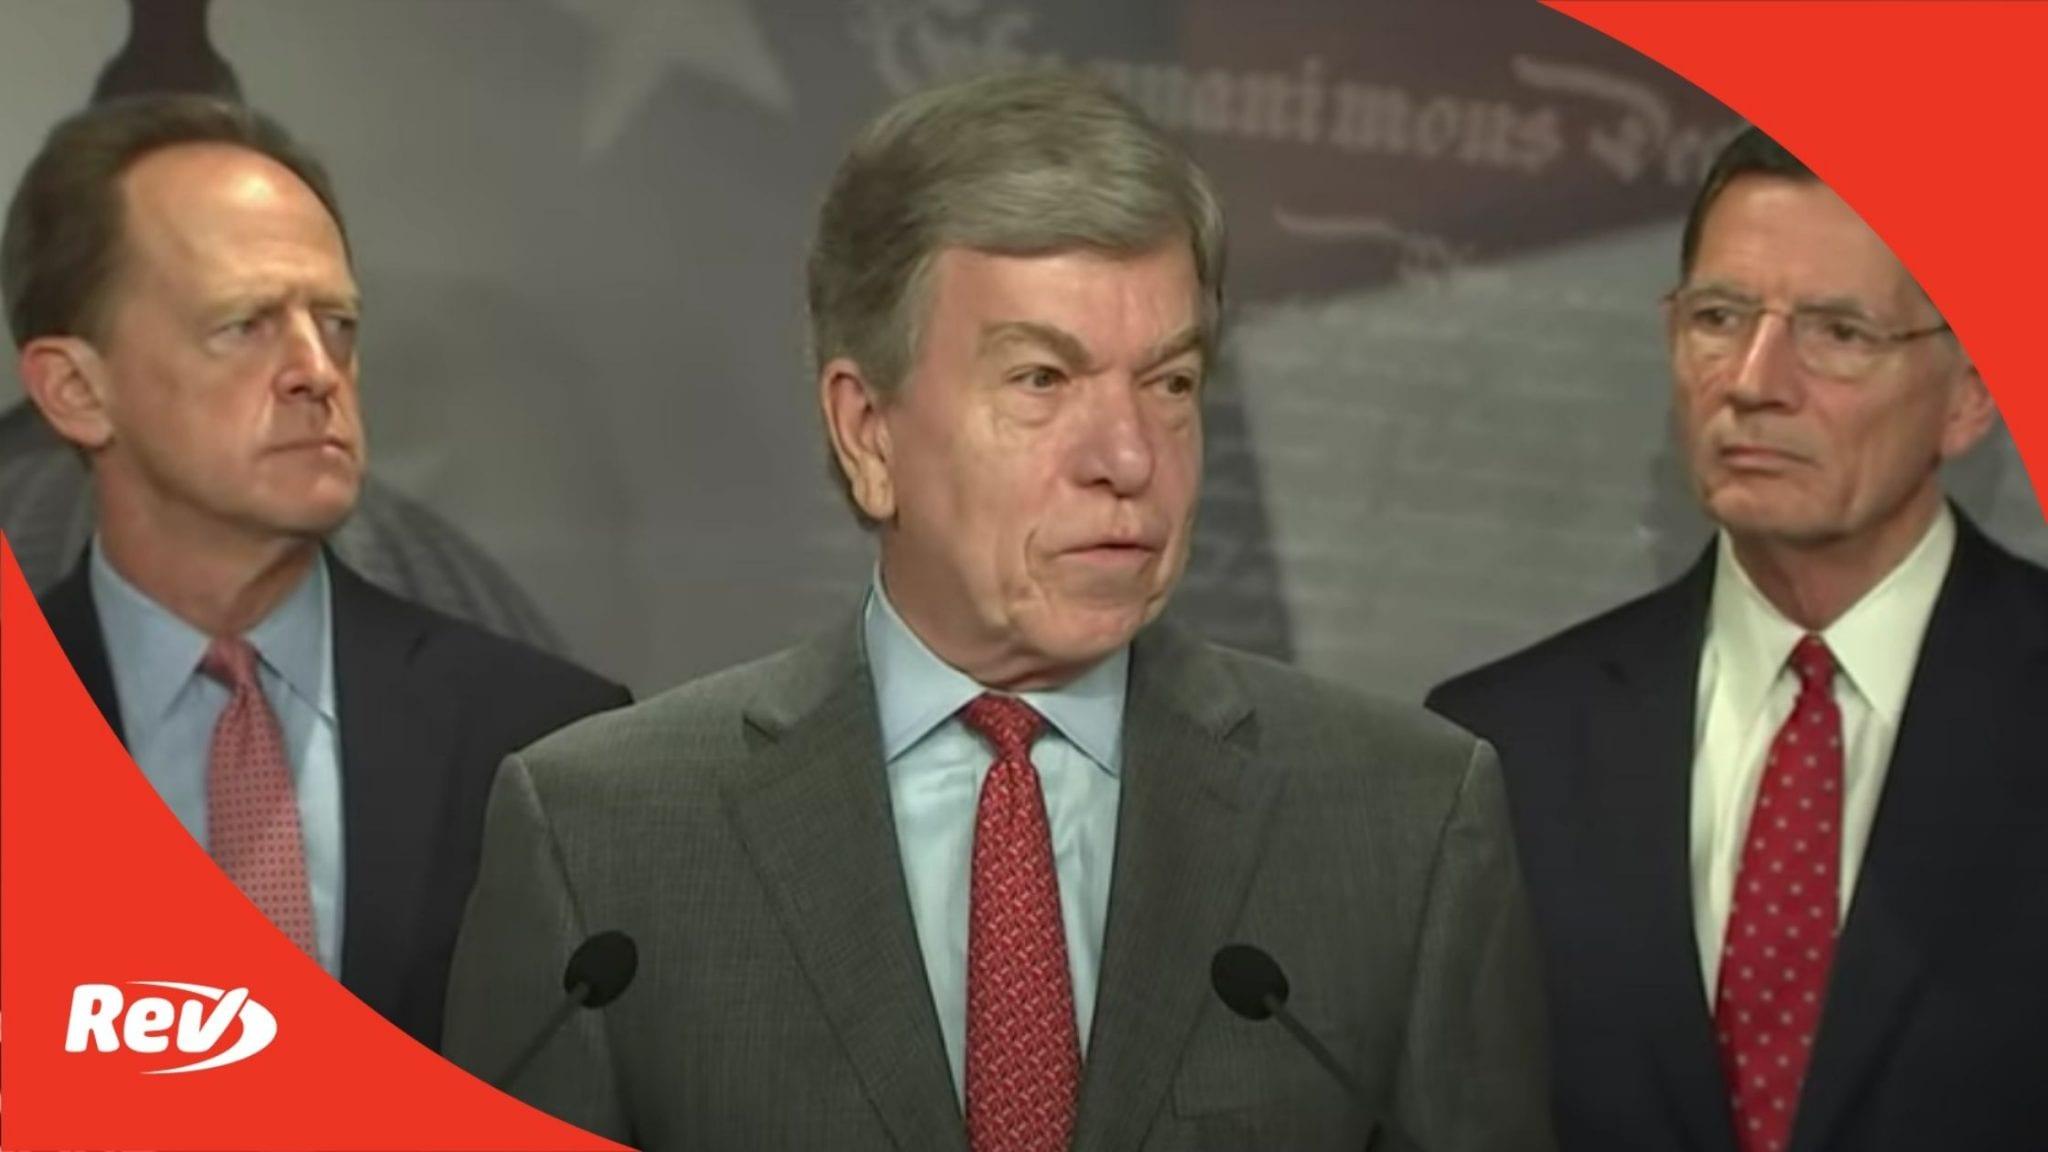 Senate Republicans Infrastructure Plan Press Conference Transcript May 27